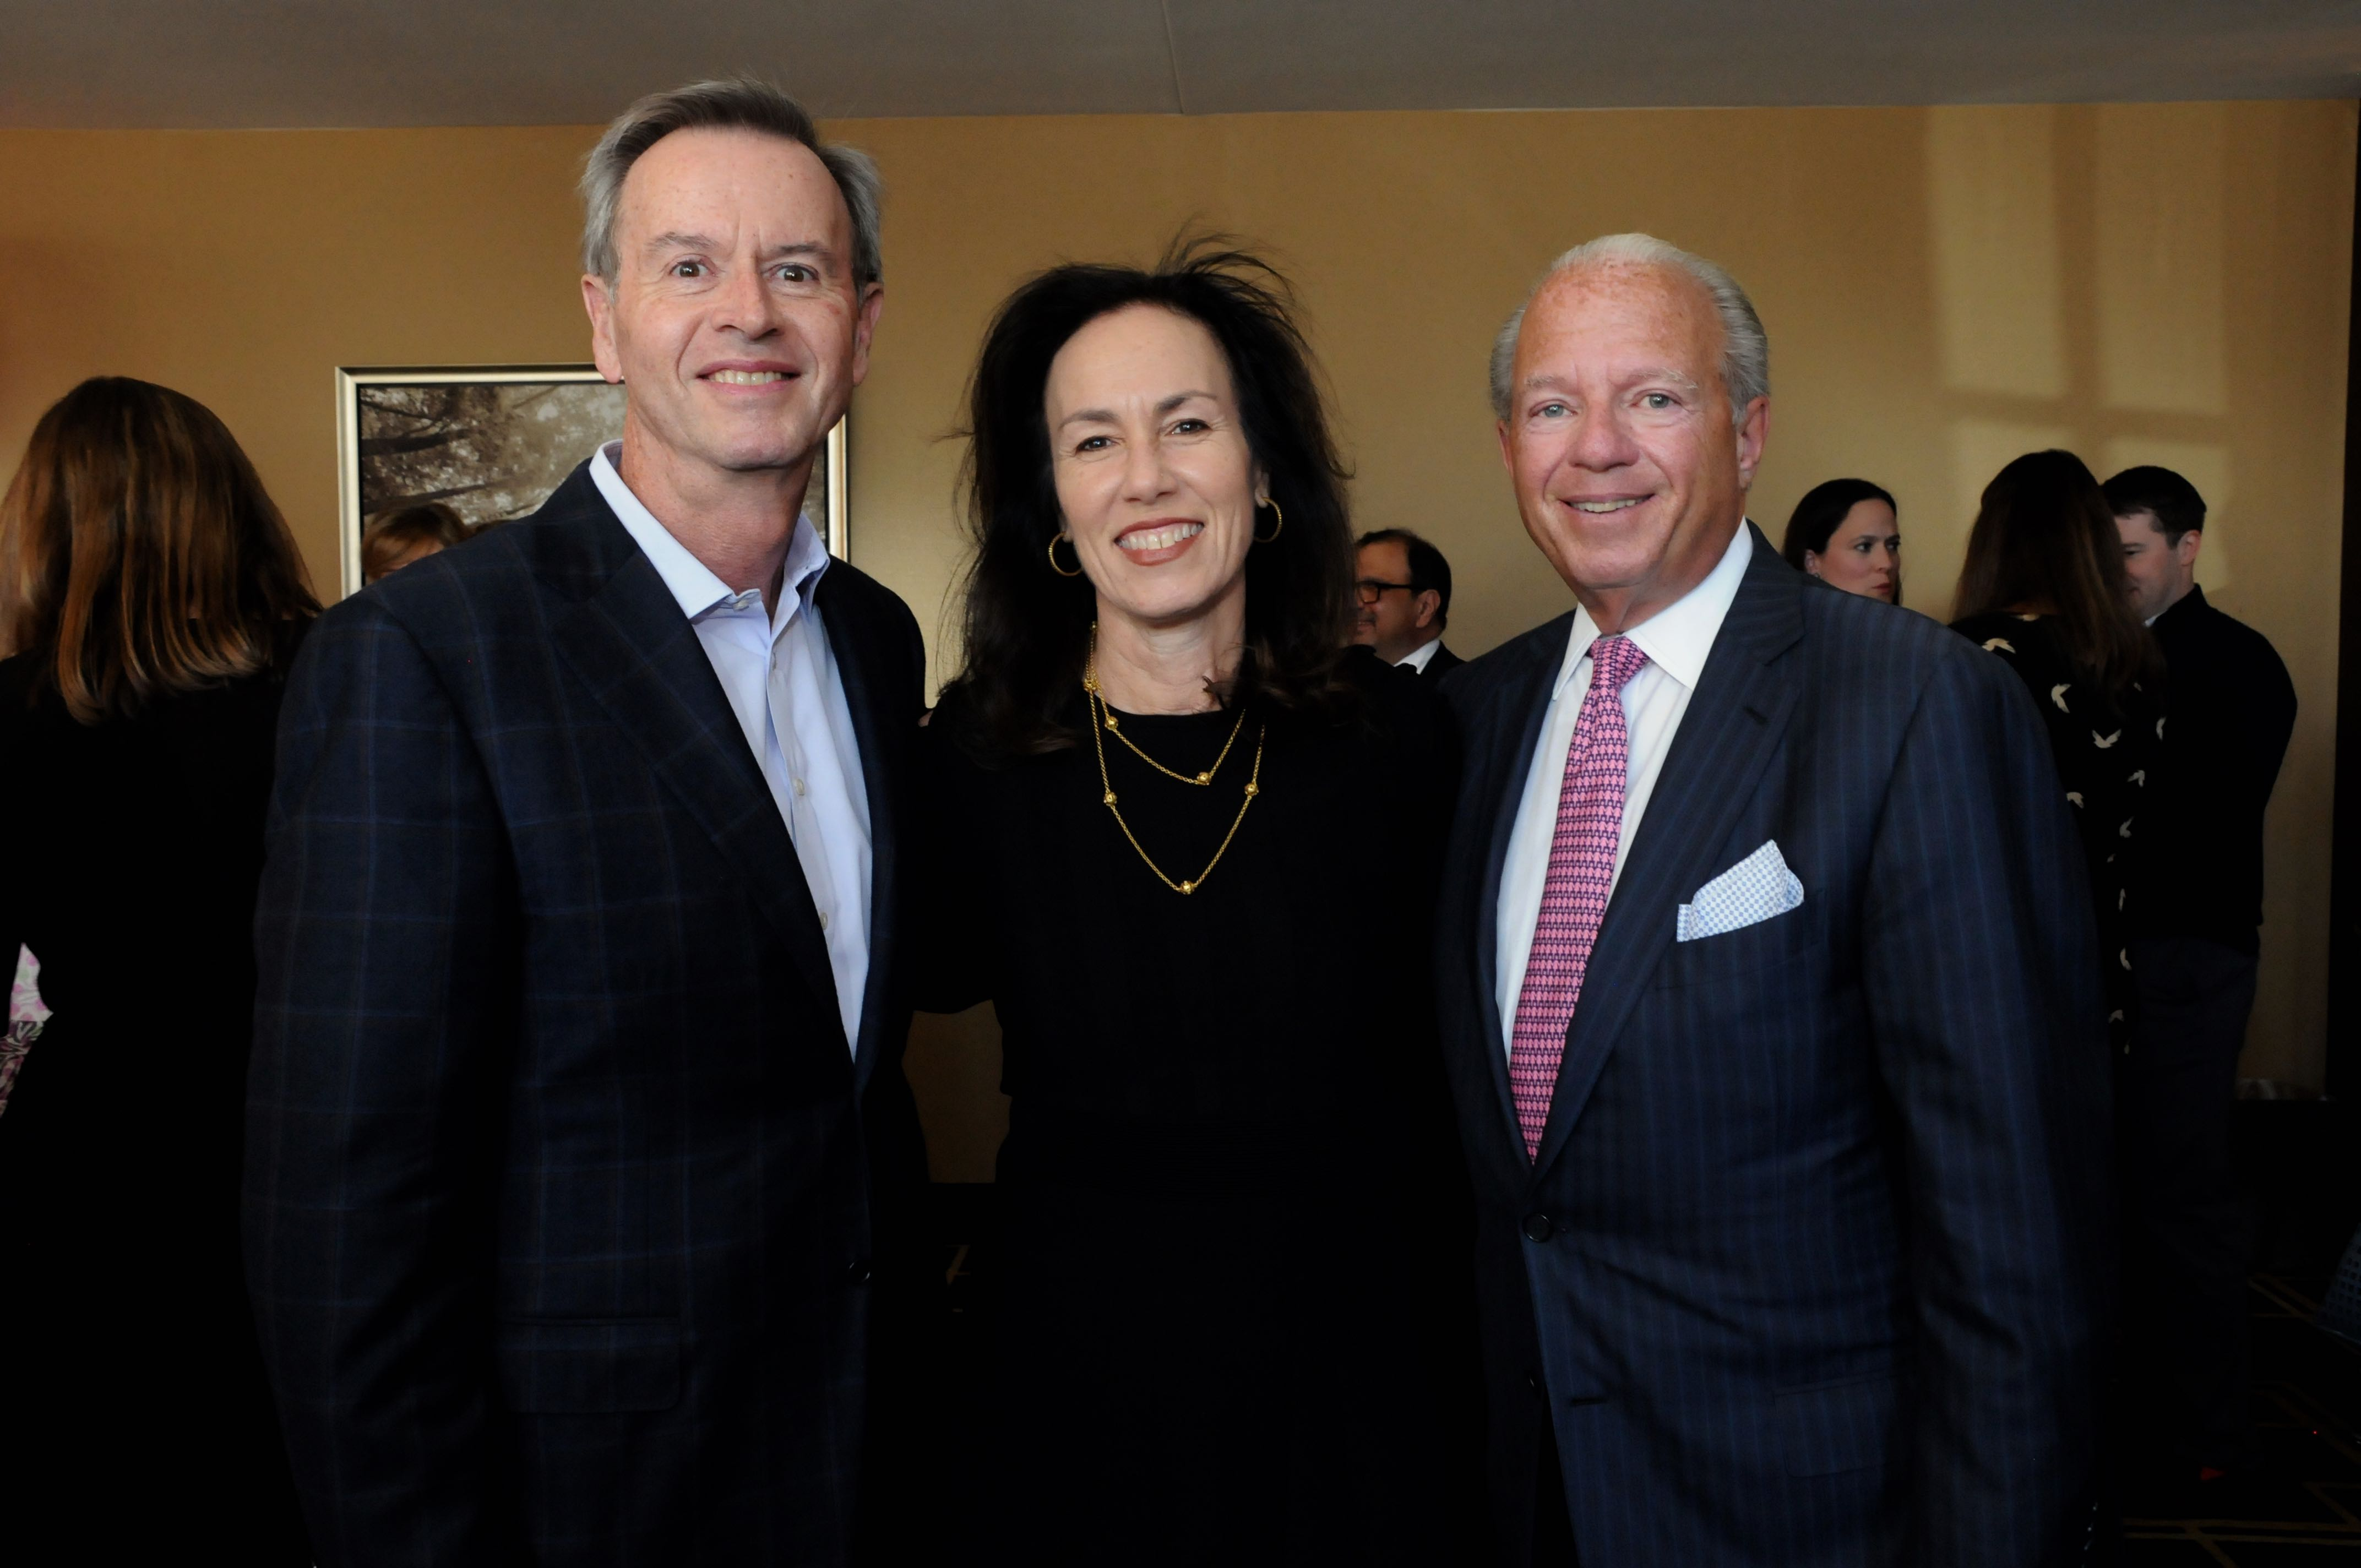 Kurt Bloedell, Dr. Linda LaTrenta, Frank Corvino